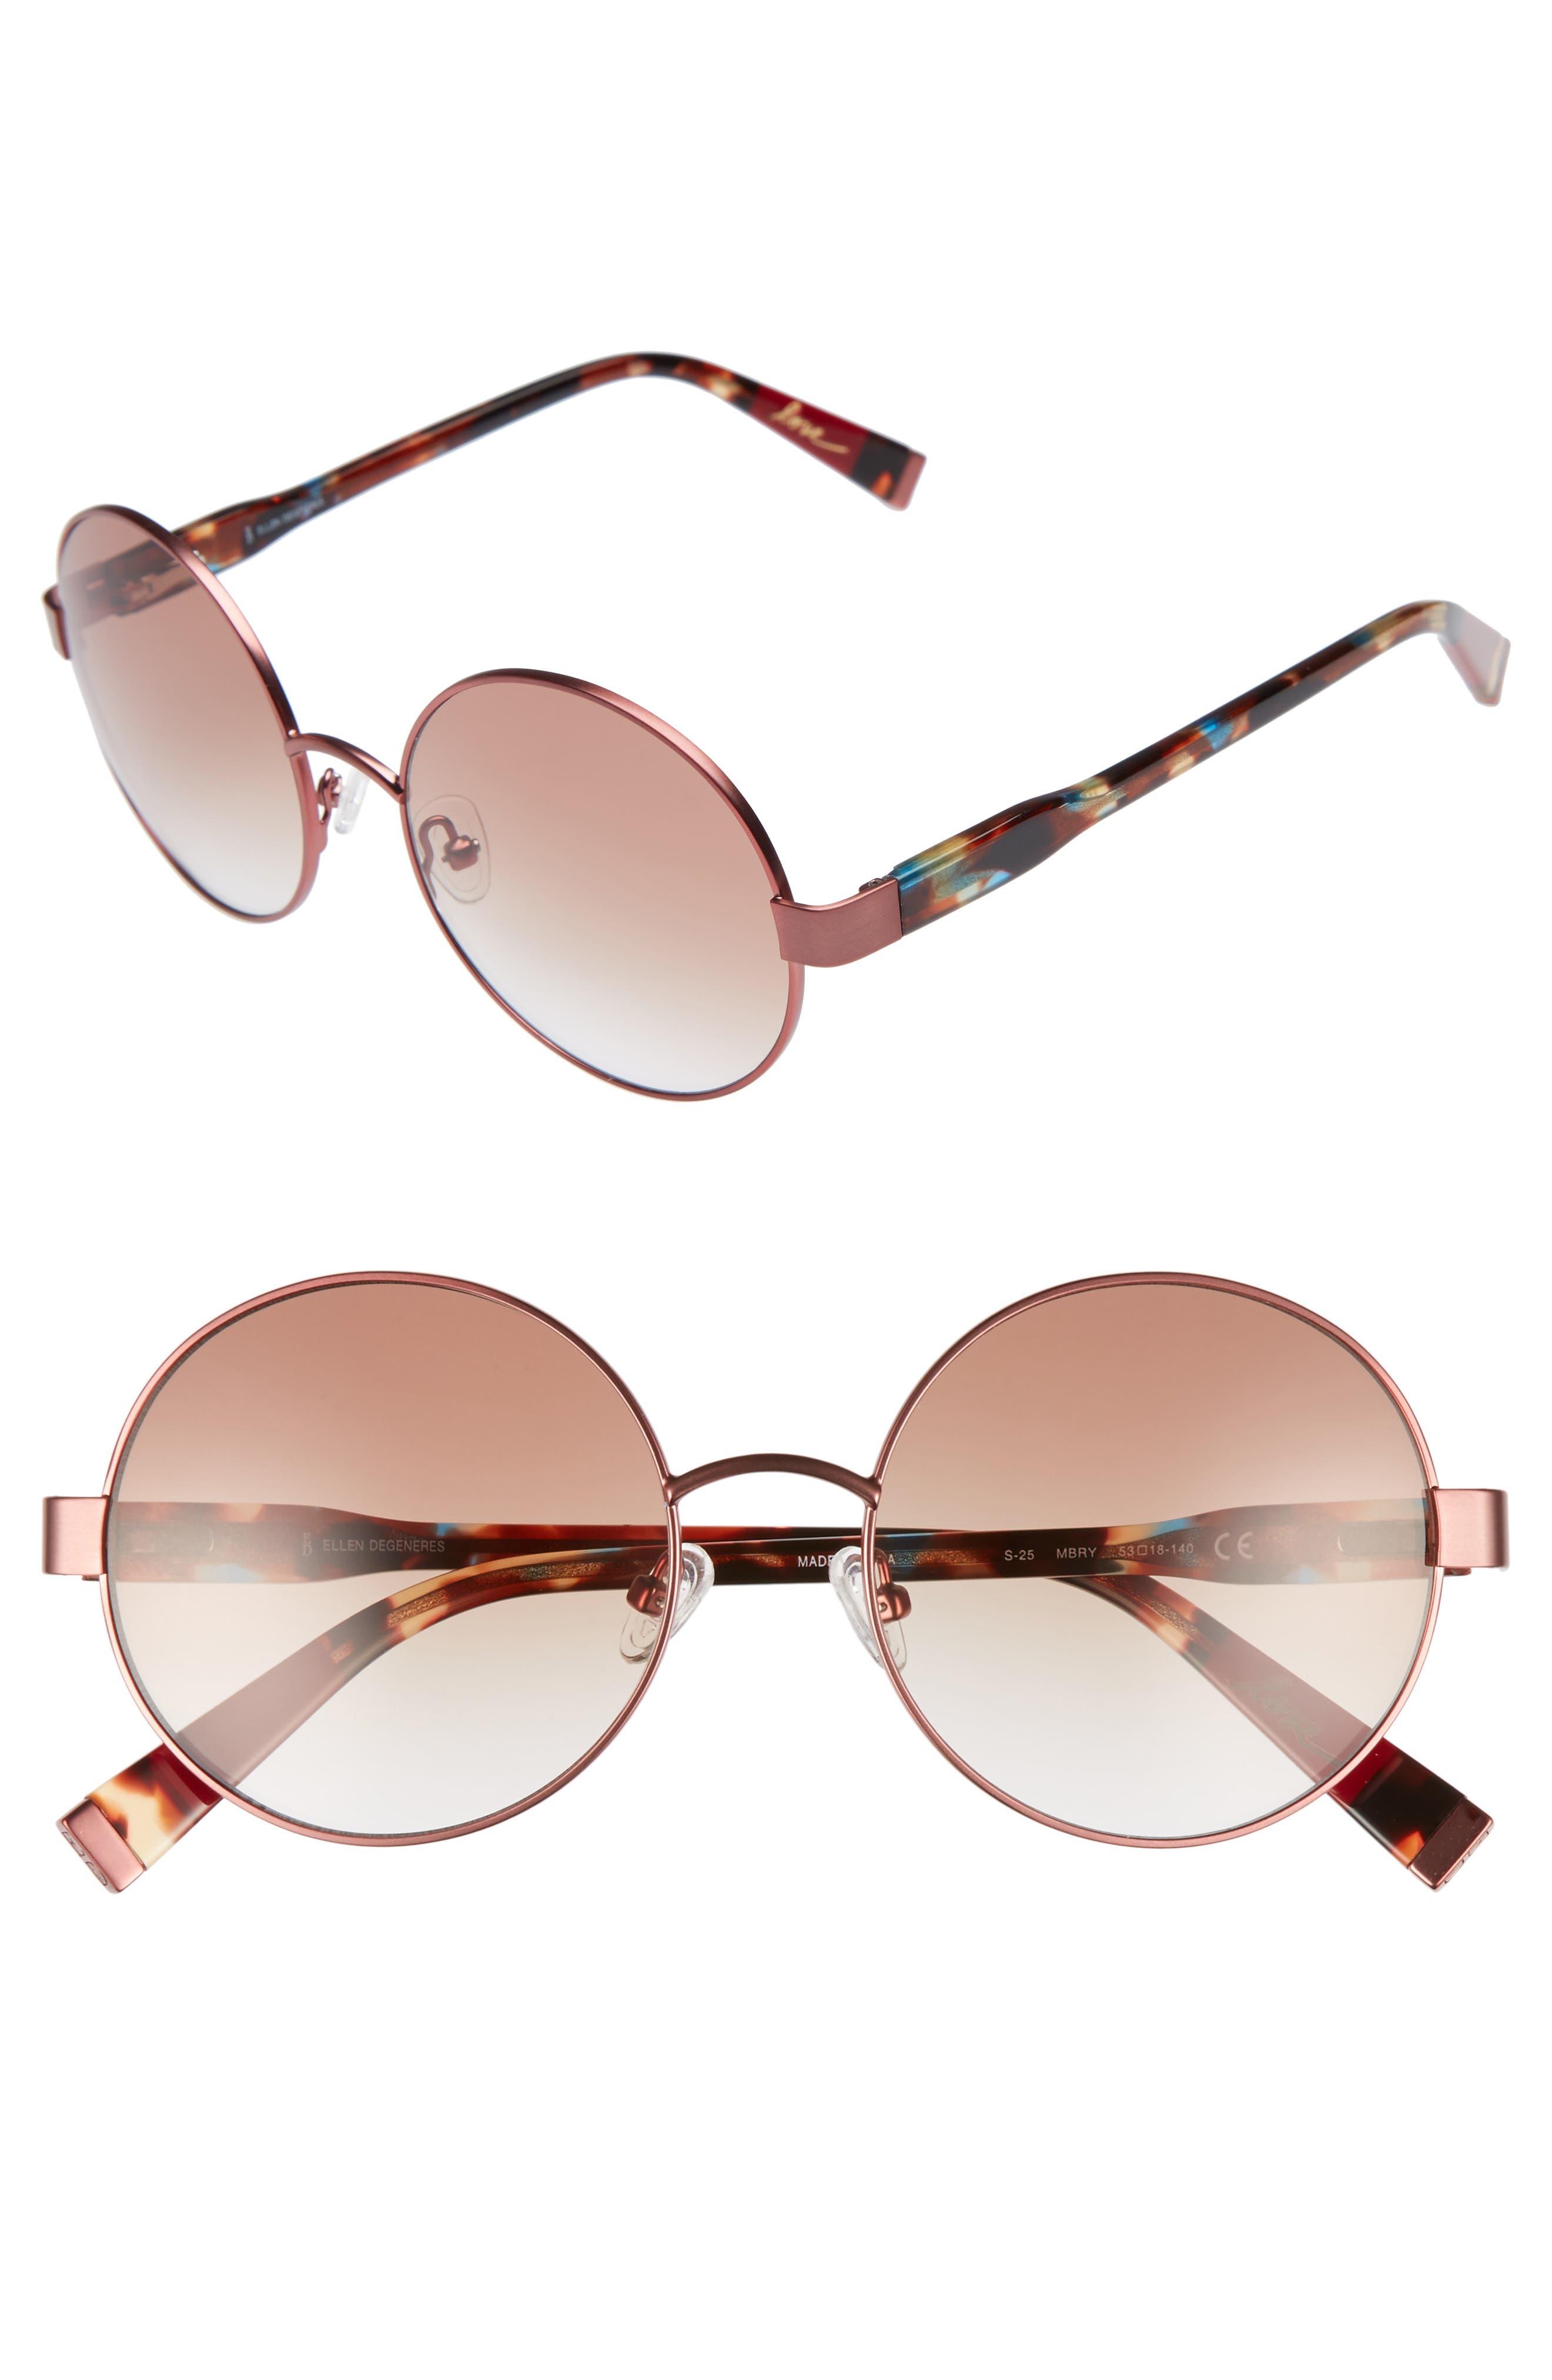 53mm Round Sunglasses,                             Main thumbnail 1, color,                             MATTE BERRY